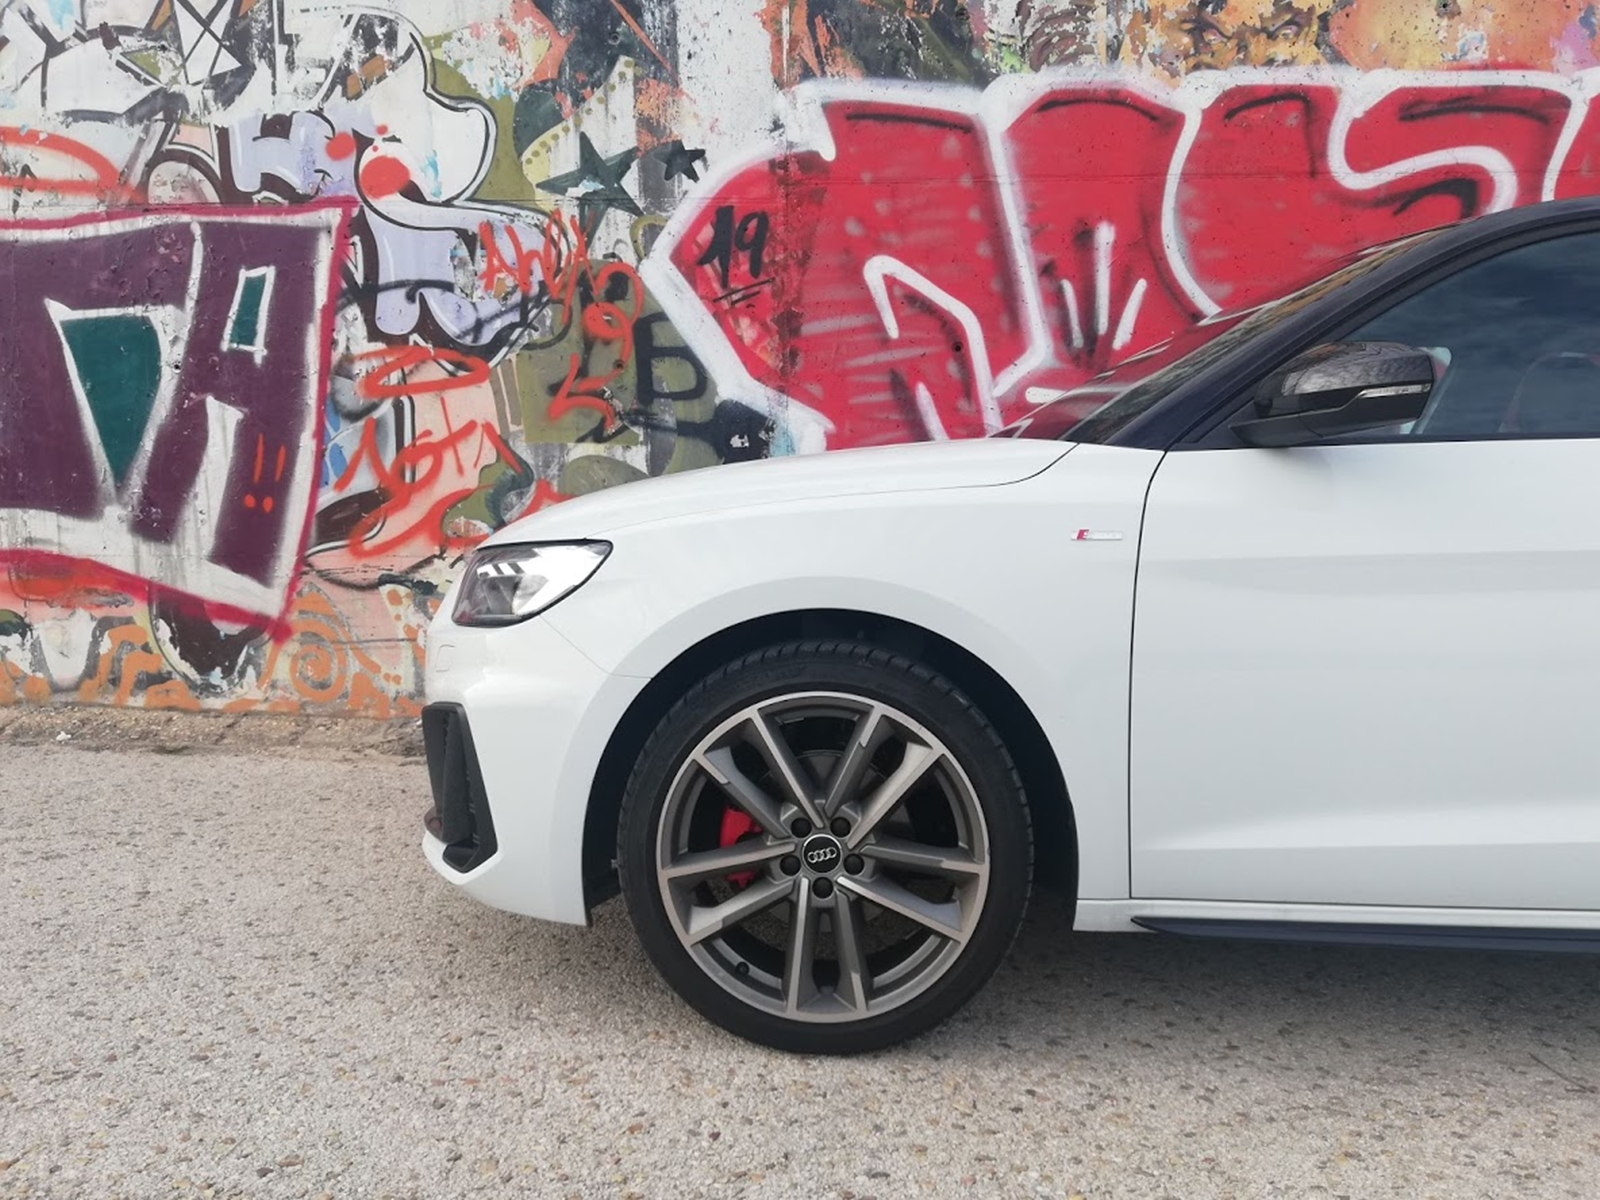 Prueba Audi A1 25 Tfsi (6)